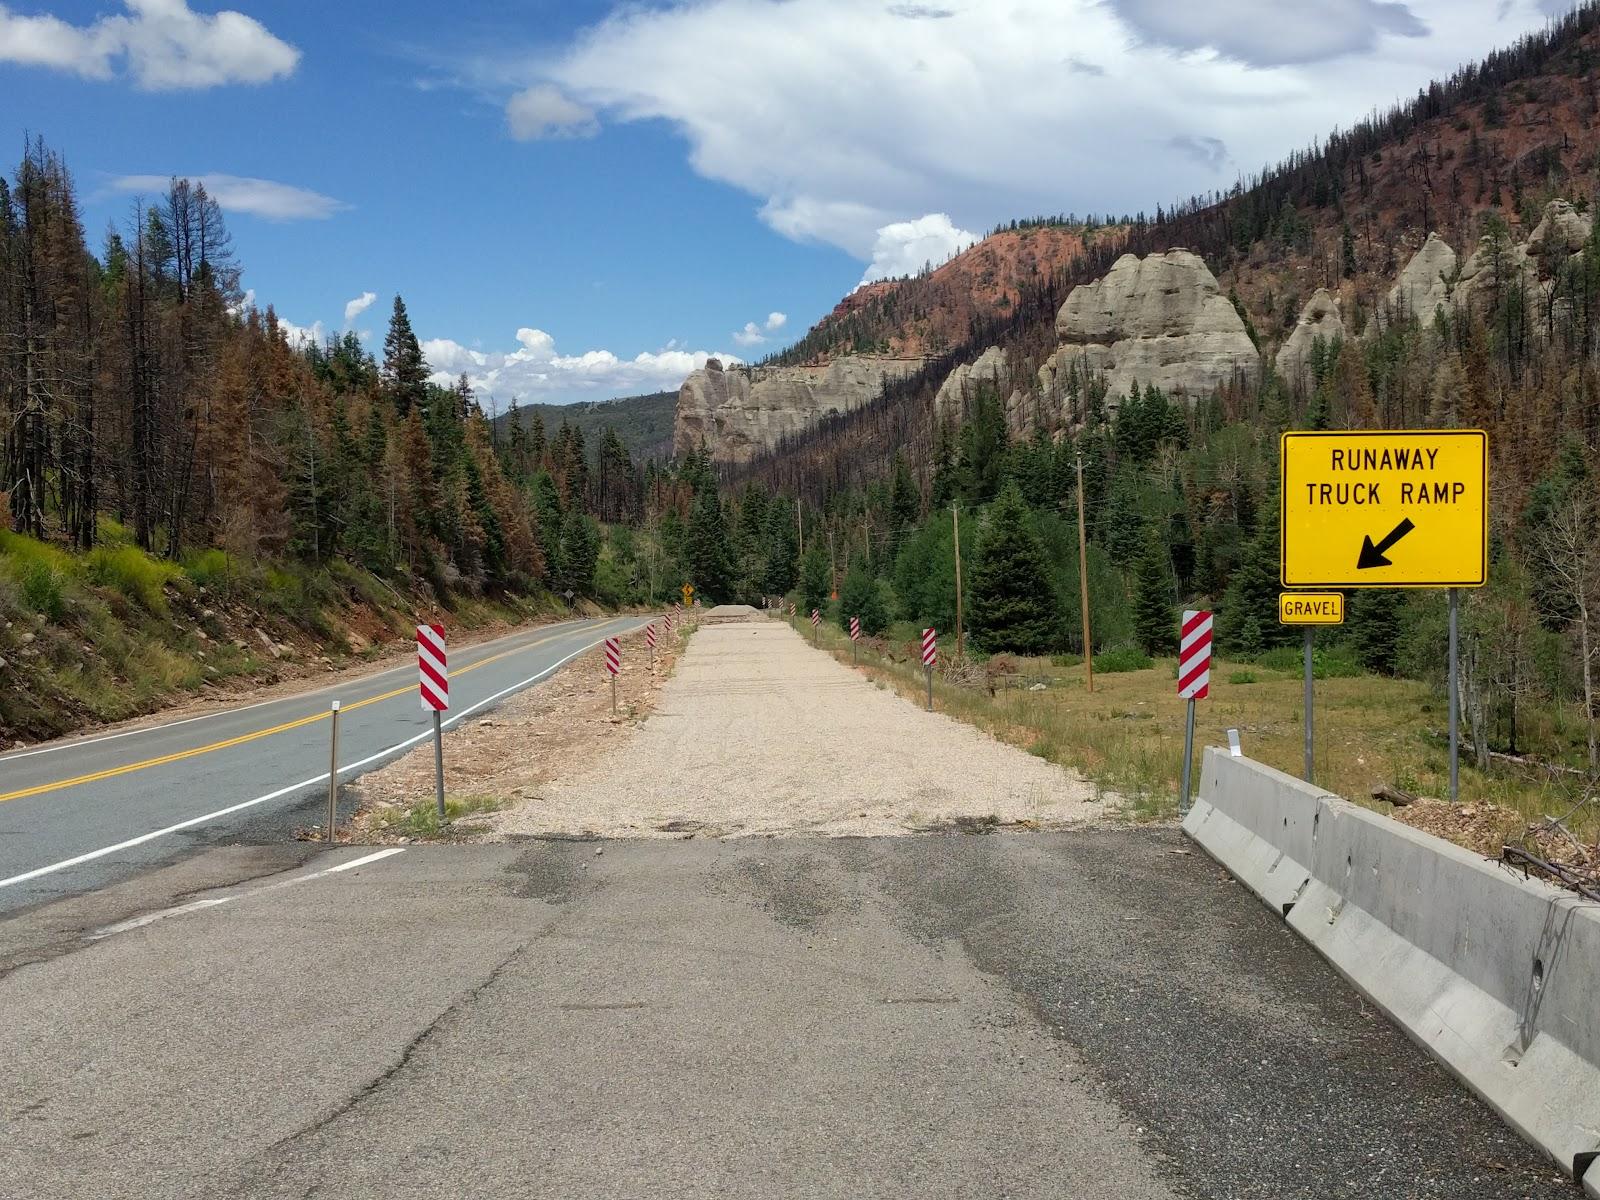 Climbing Hwy 143 by bike - runaway truck ramp sign